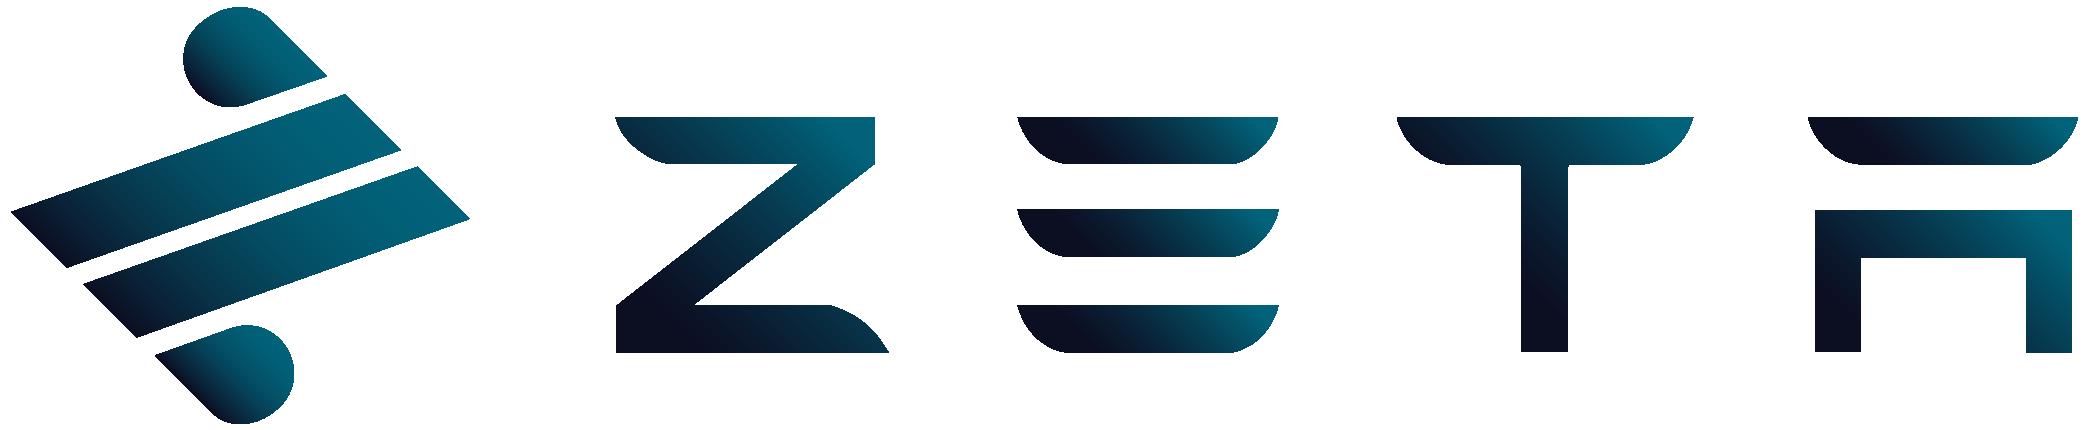 gradient_full_logo_horizontal